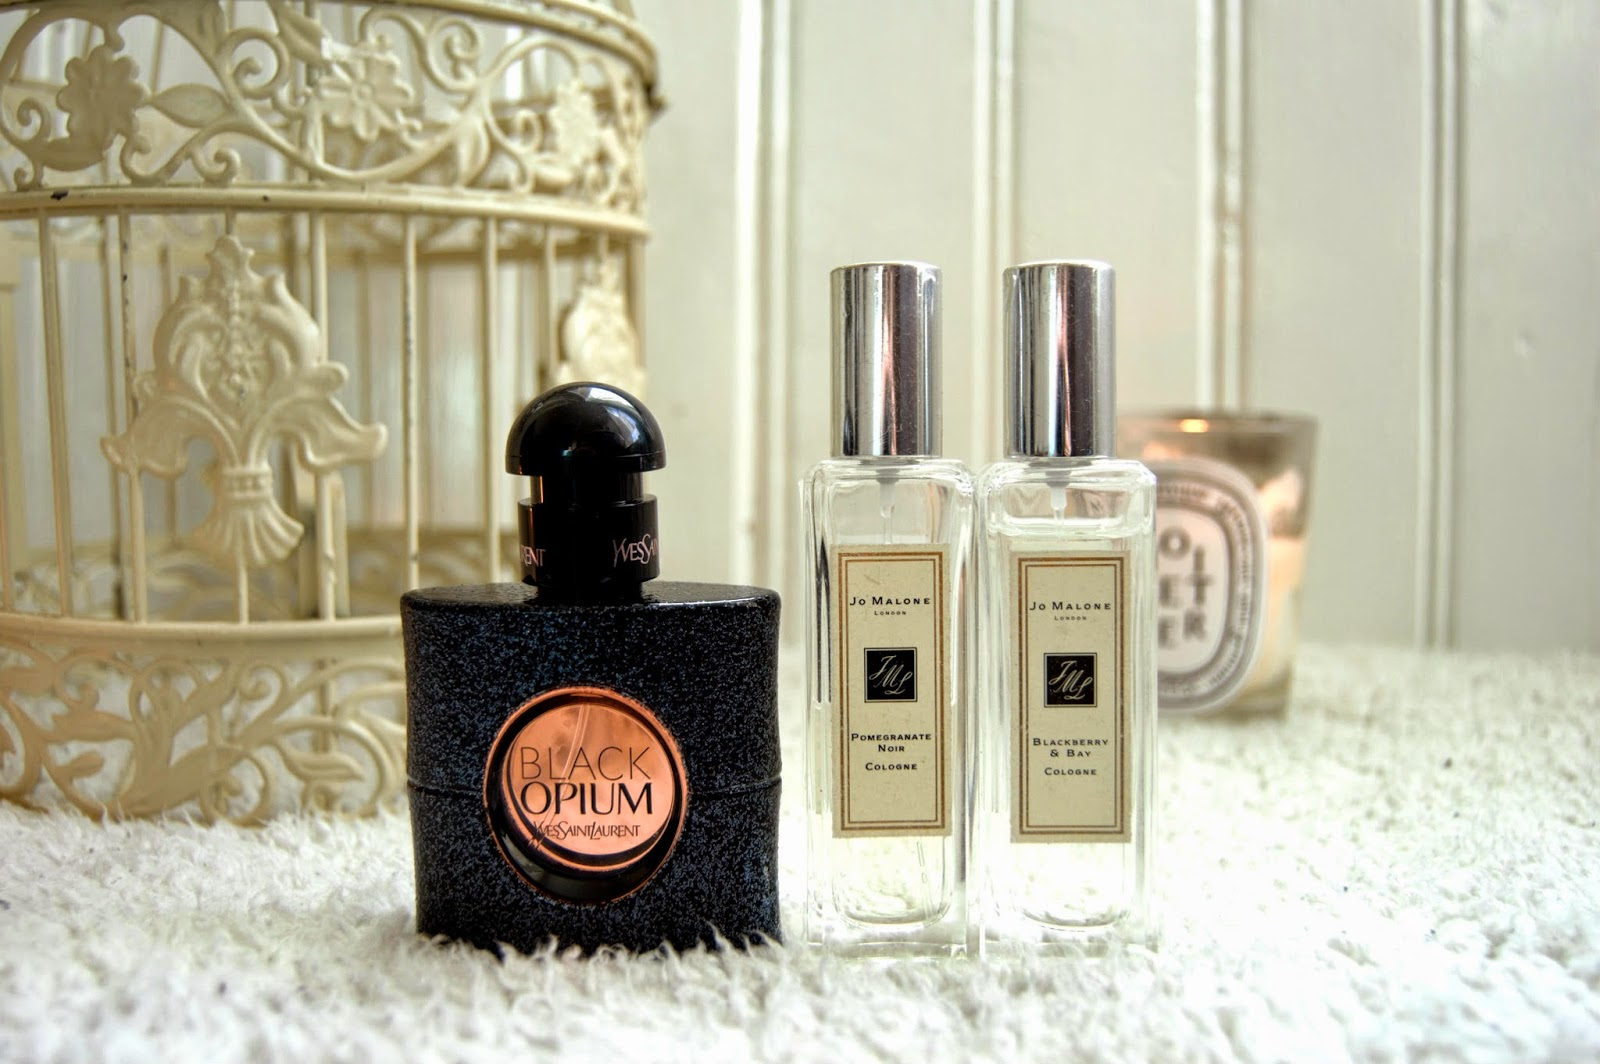 Winter-fragrance-Jo Malone-Pomegranate Noir-Blackberry and Bay-YSL-Black Opium